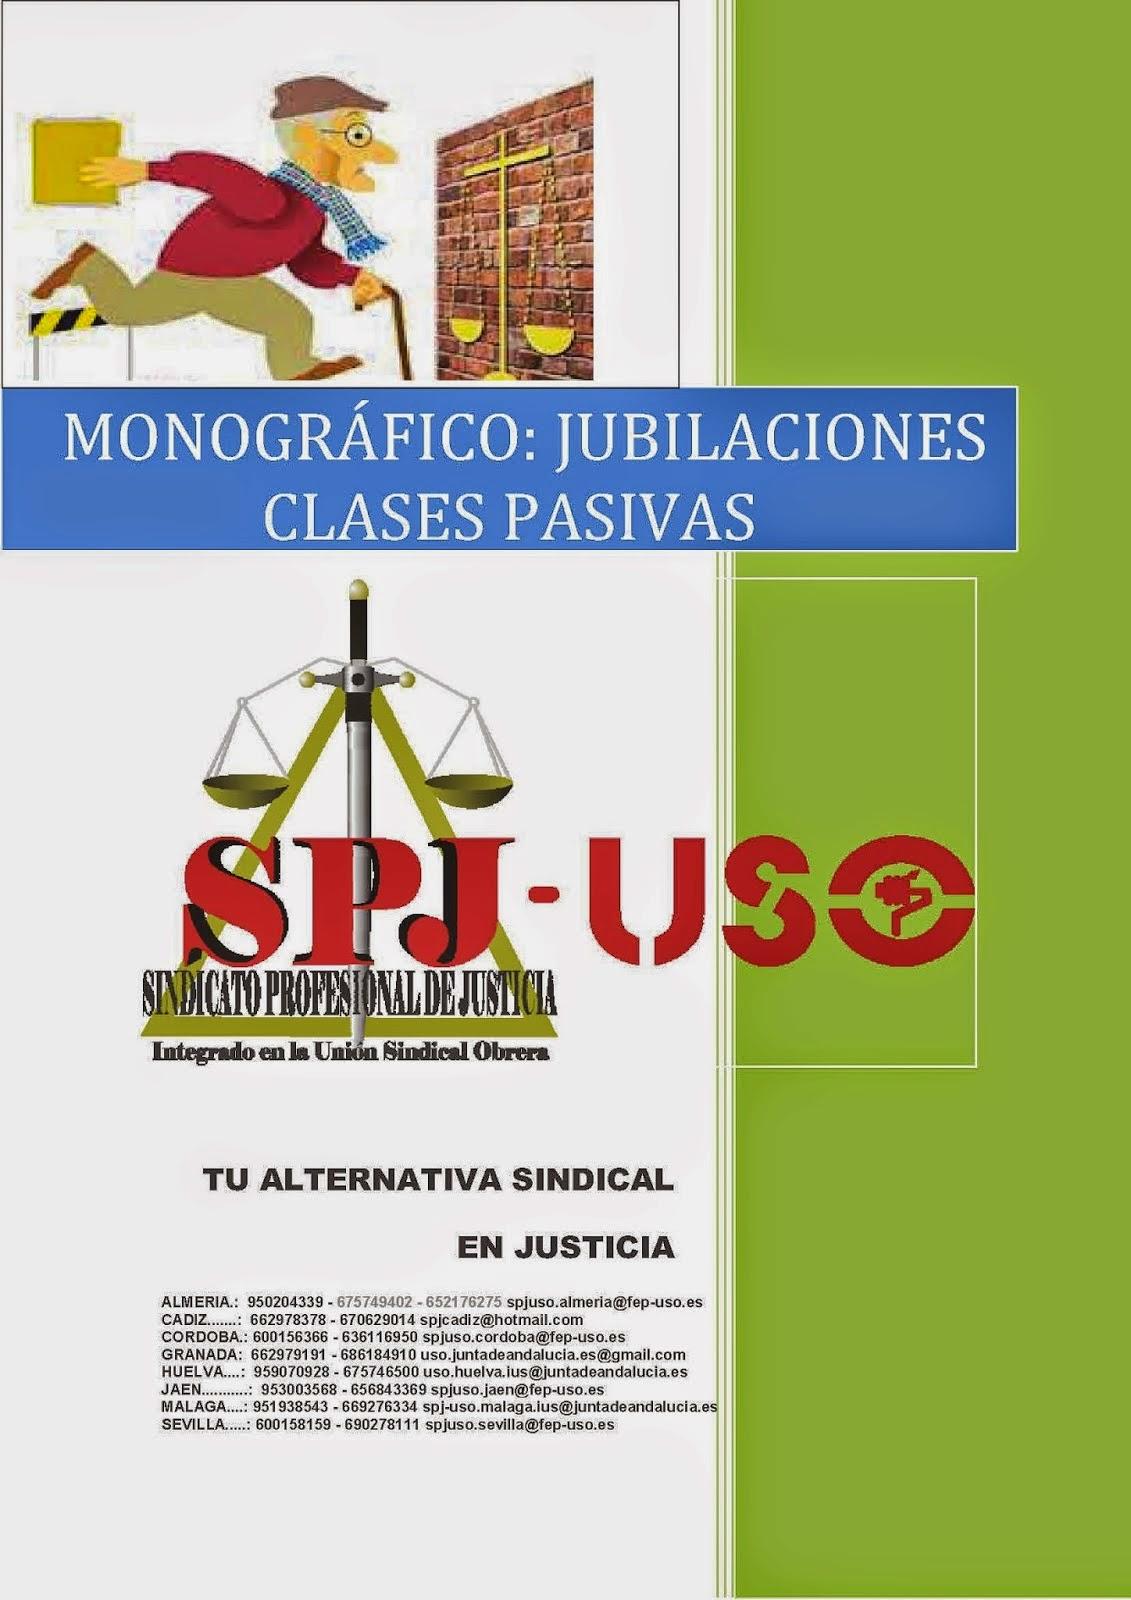 BOLETIN MONOGRAFICO JUBILACIONES CLASES PASIVAS